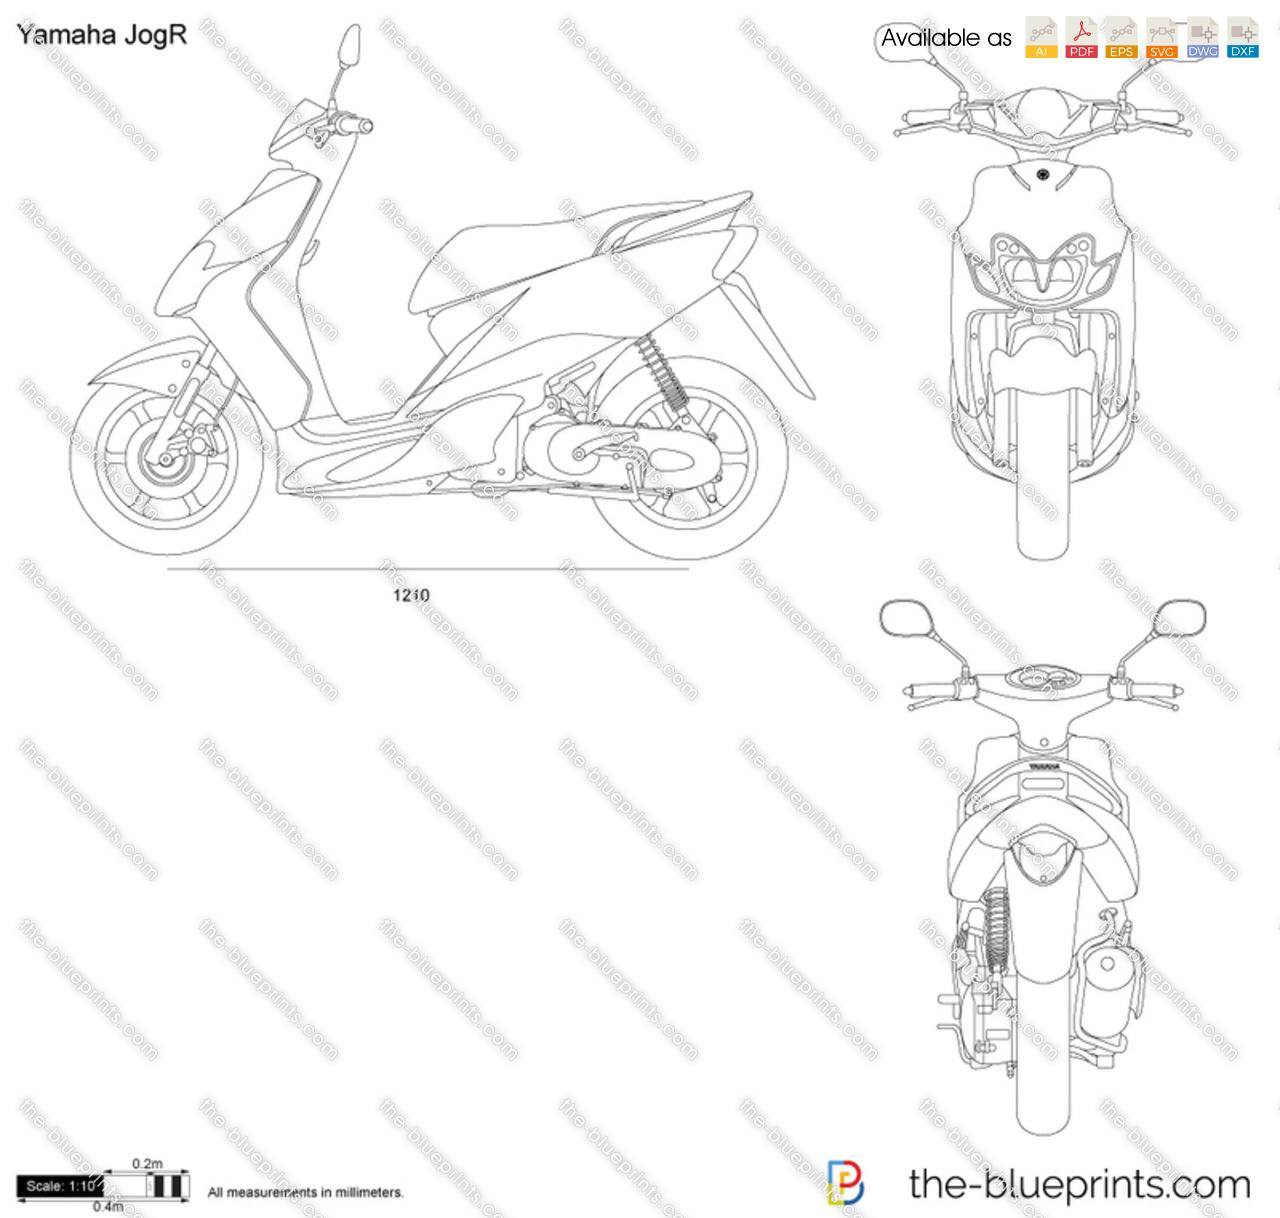 Yamaha JogR vector drawing